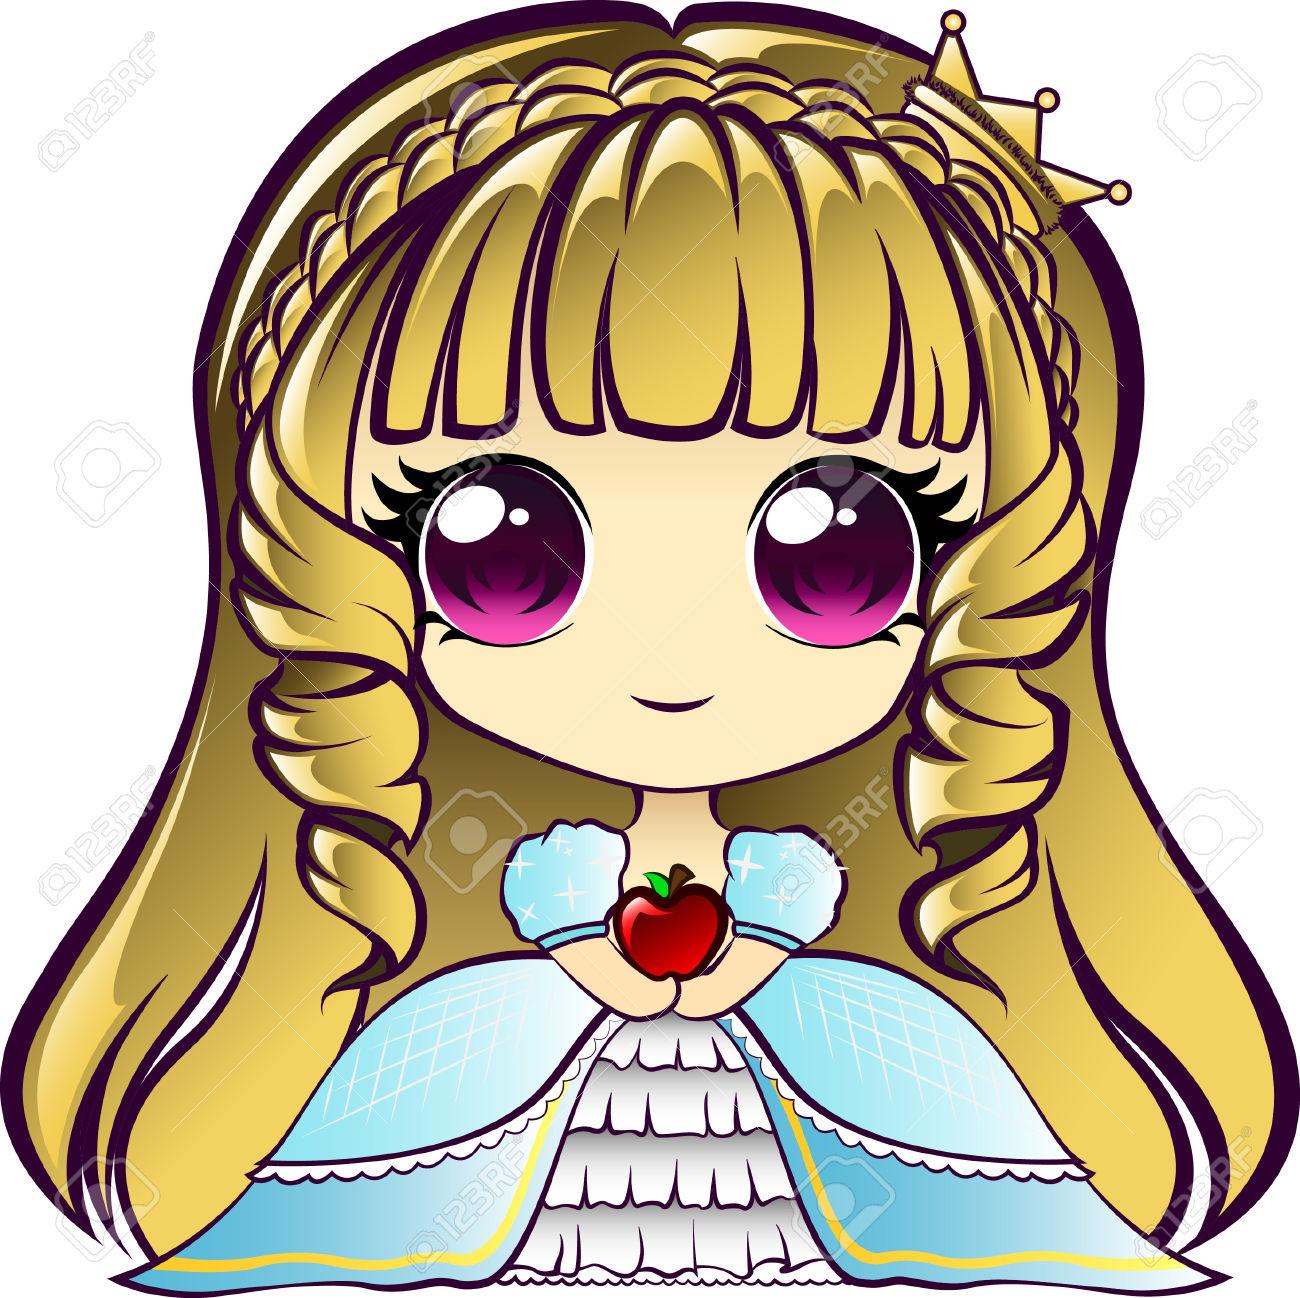 Anime clipart cute Cute anime chibi chibi clipart